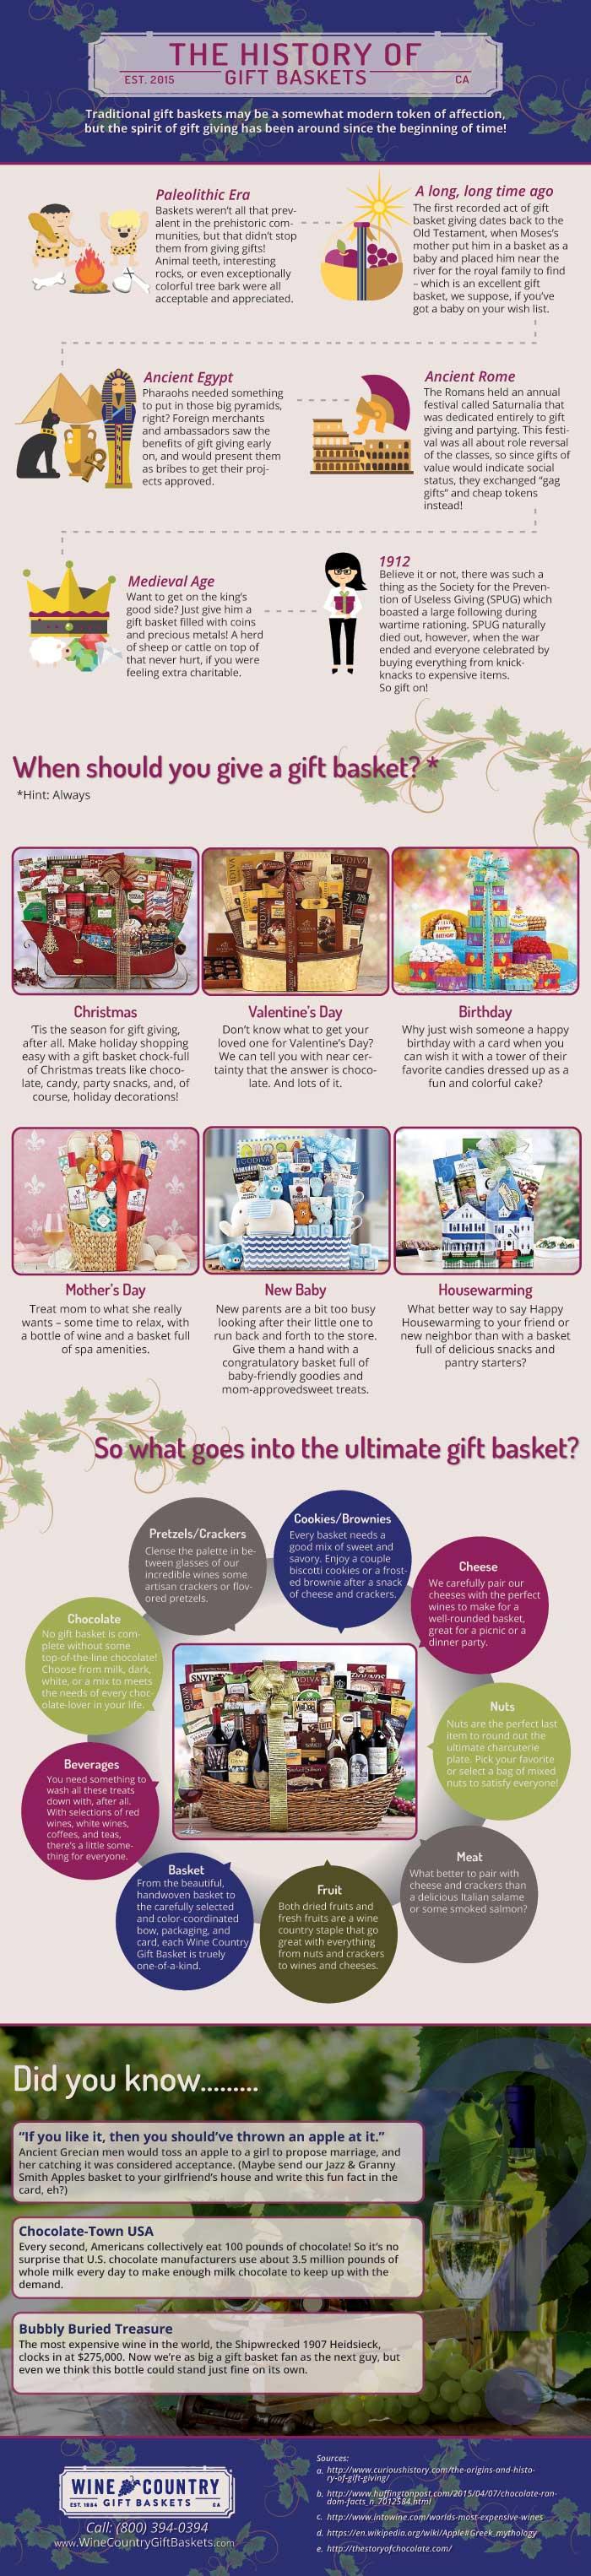 Gift Basket Industry